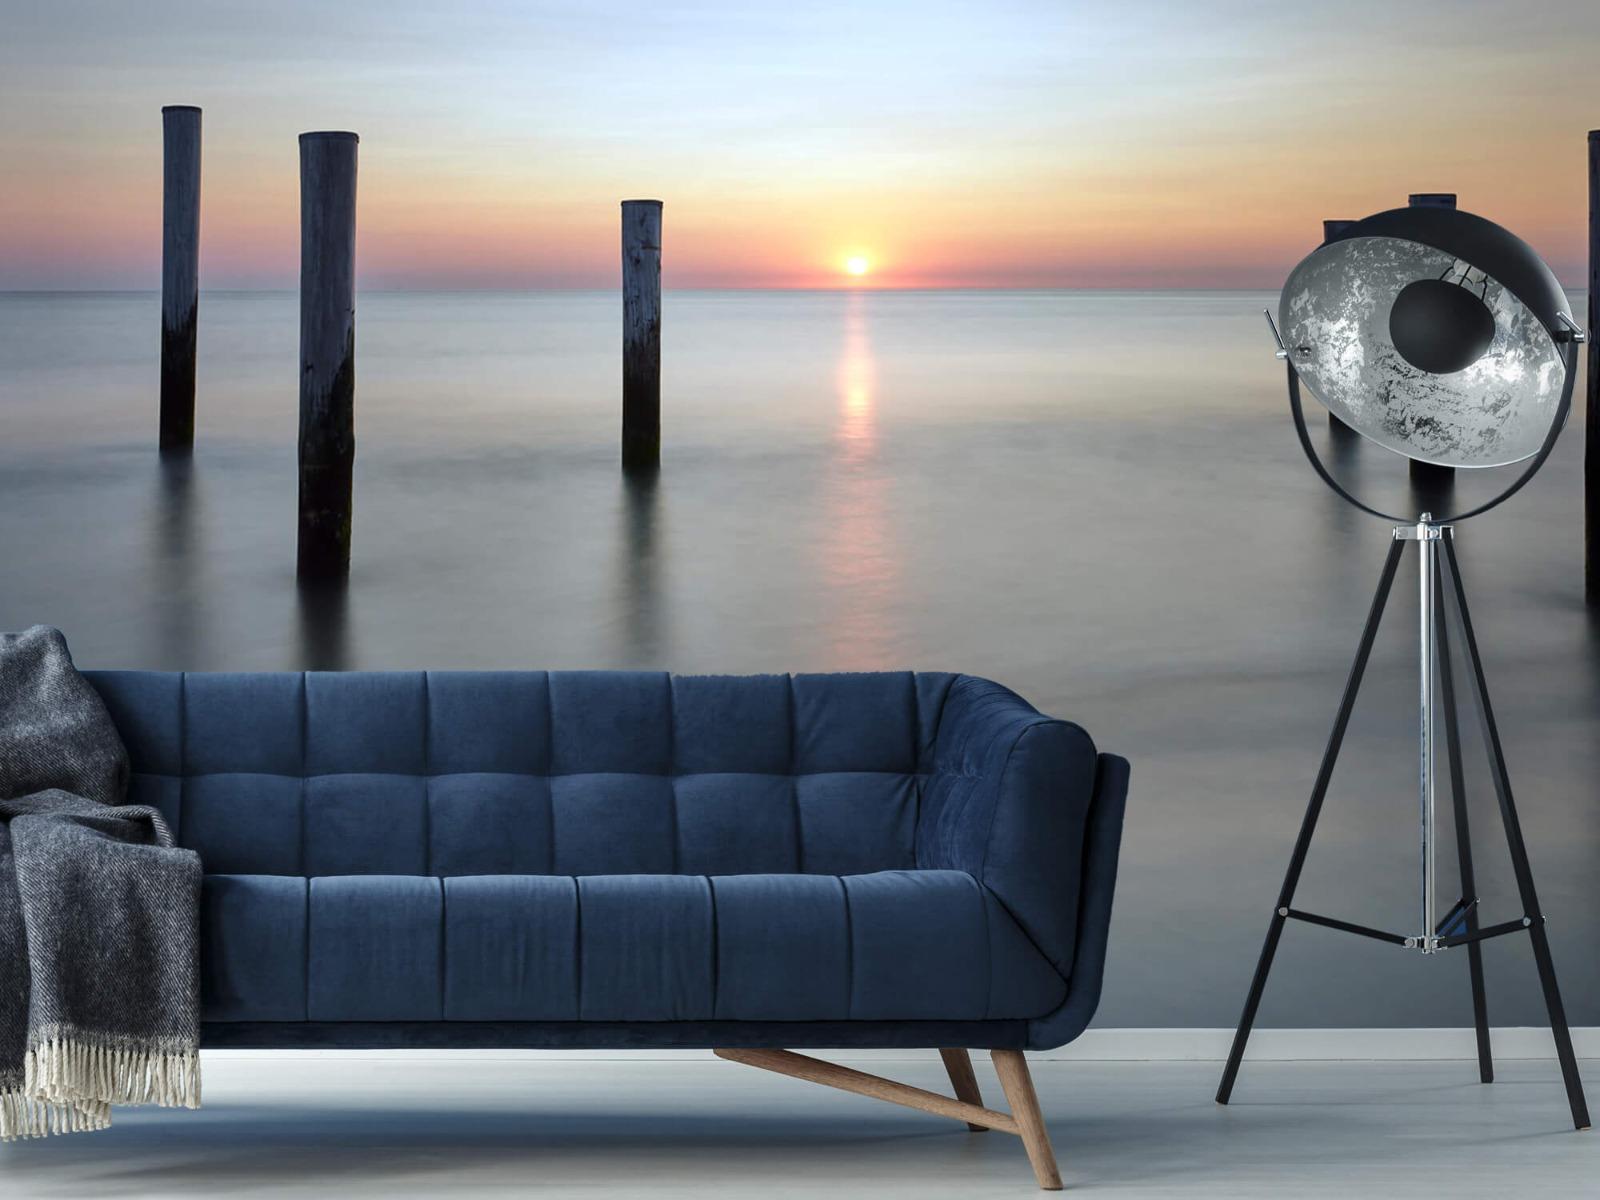 Zeeën en Oceanen - Strandpalen - Slaapkamer 15